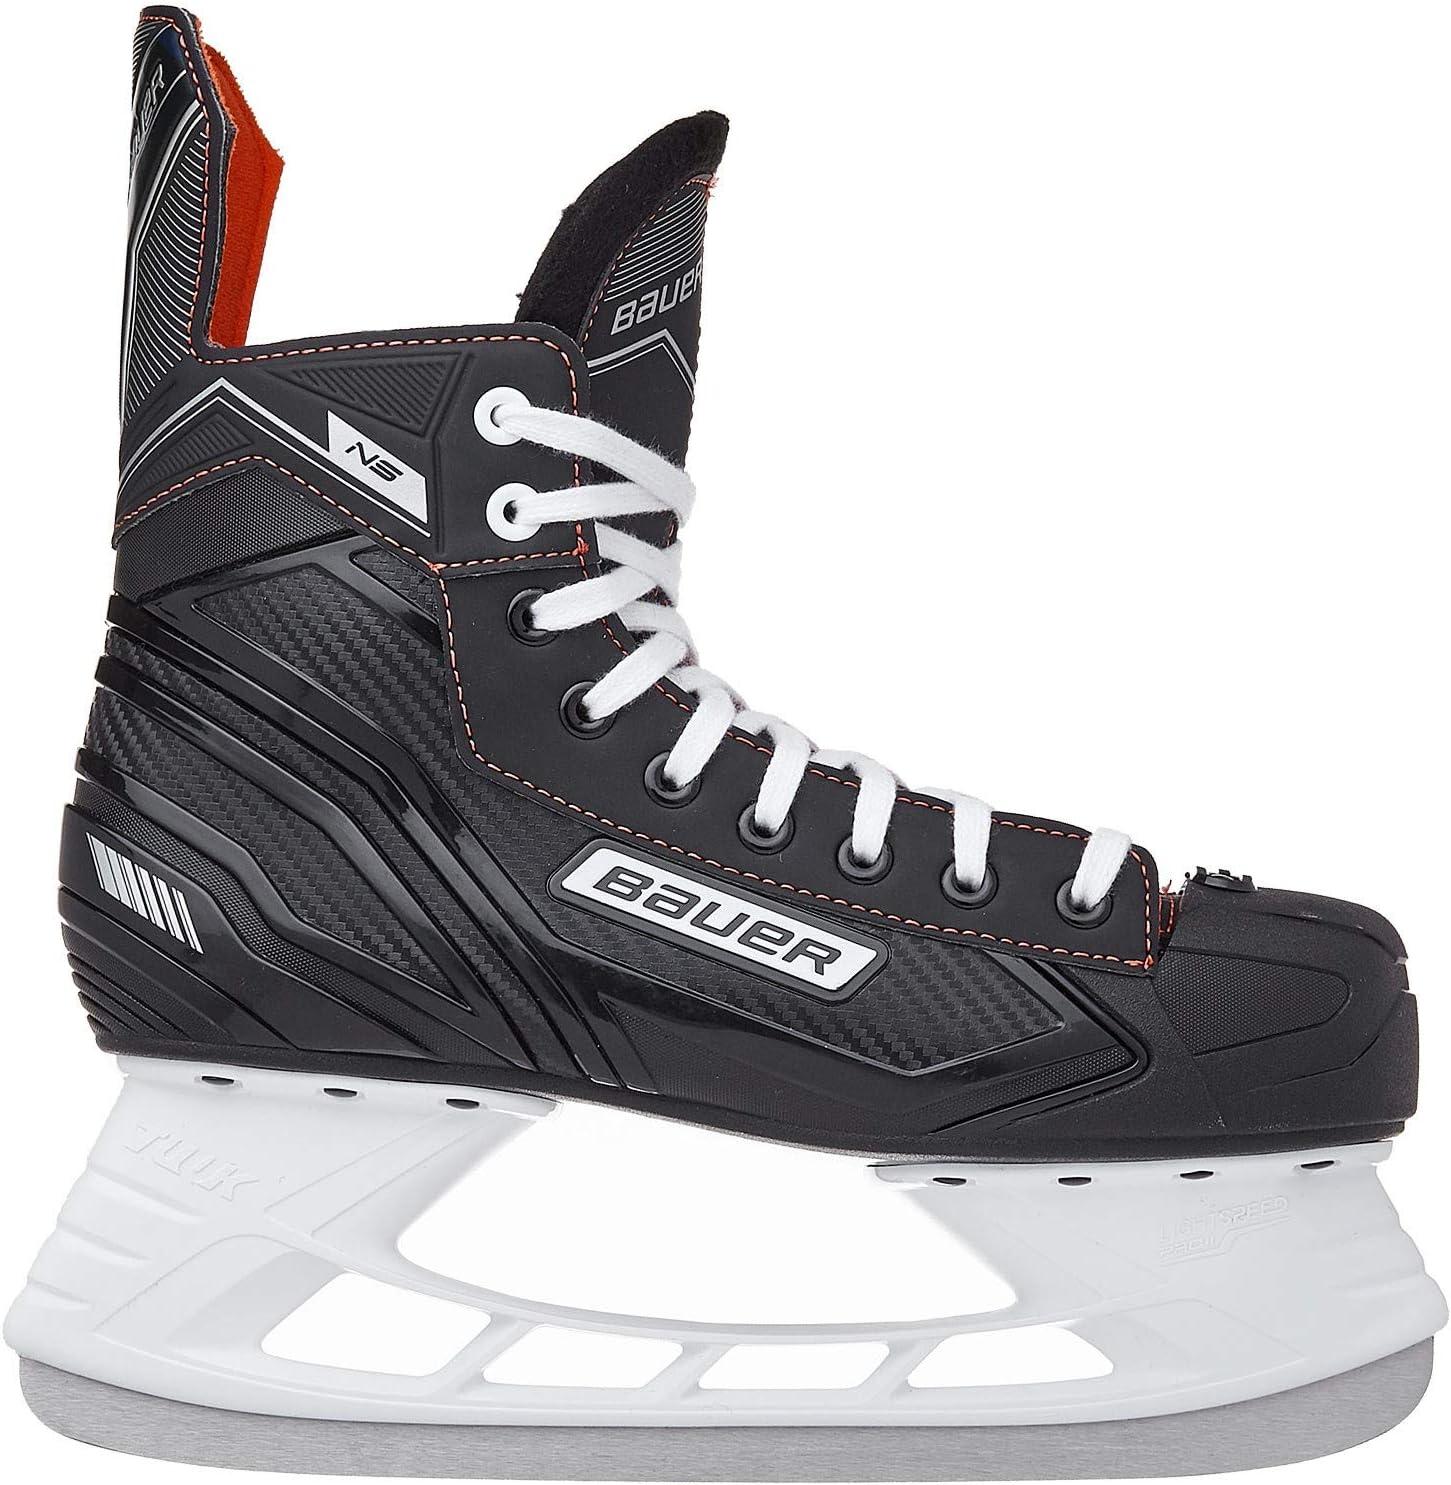 Bauer Skates NS S18 Senior